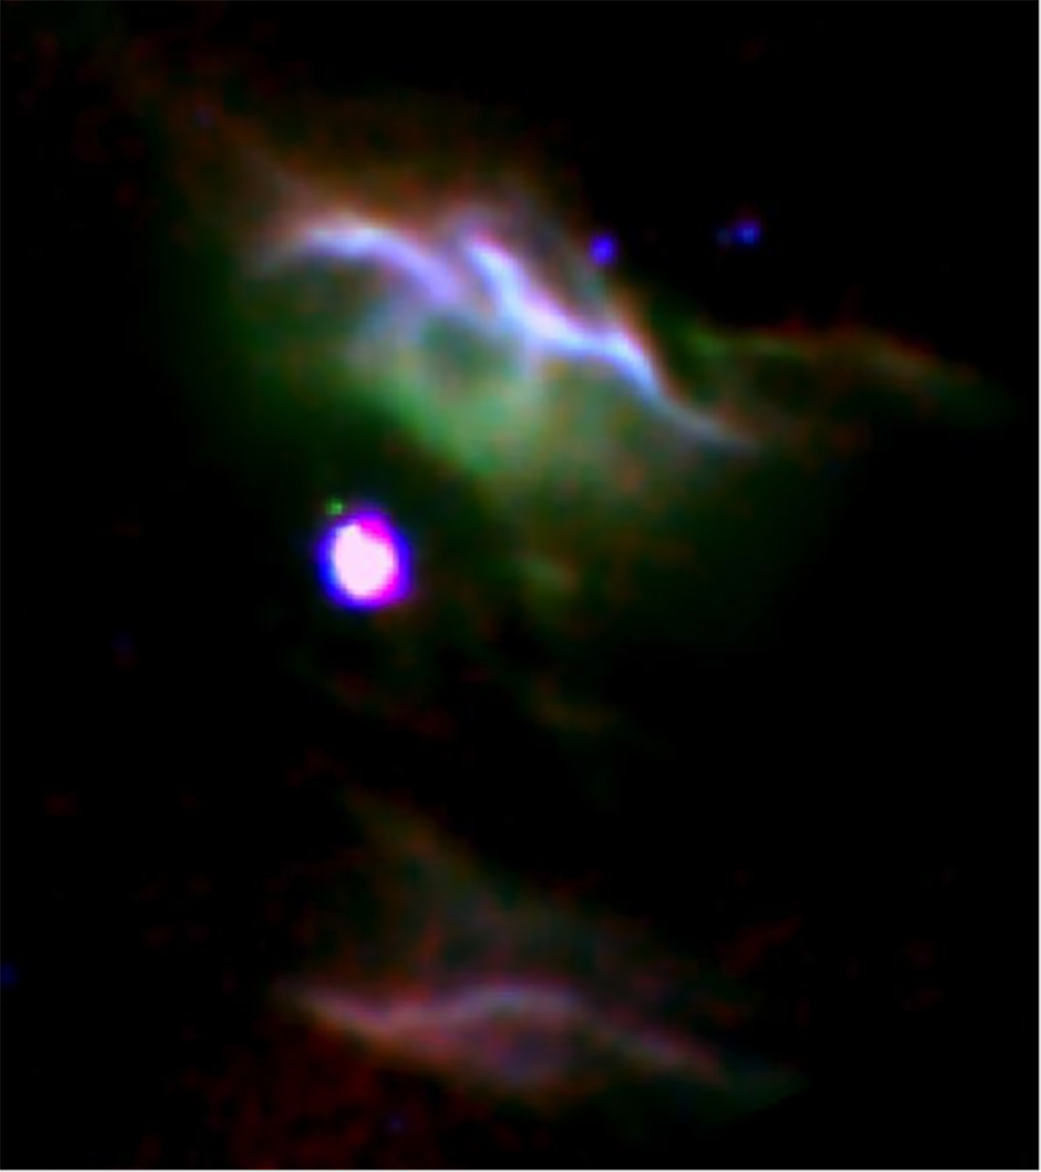 Resultado de imagem para http://www.nasa.gov/feature/kitchen-smoke-molecules-in-nebula-offer-clues-to-the-building-blocks-of-life